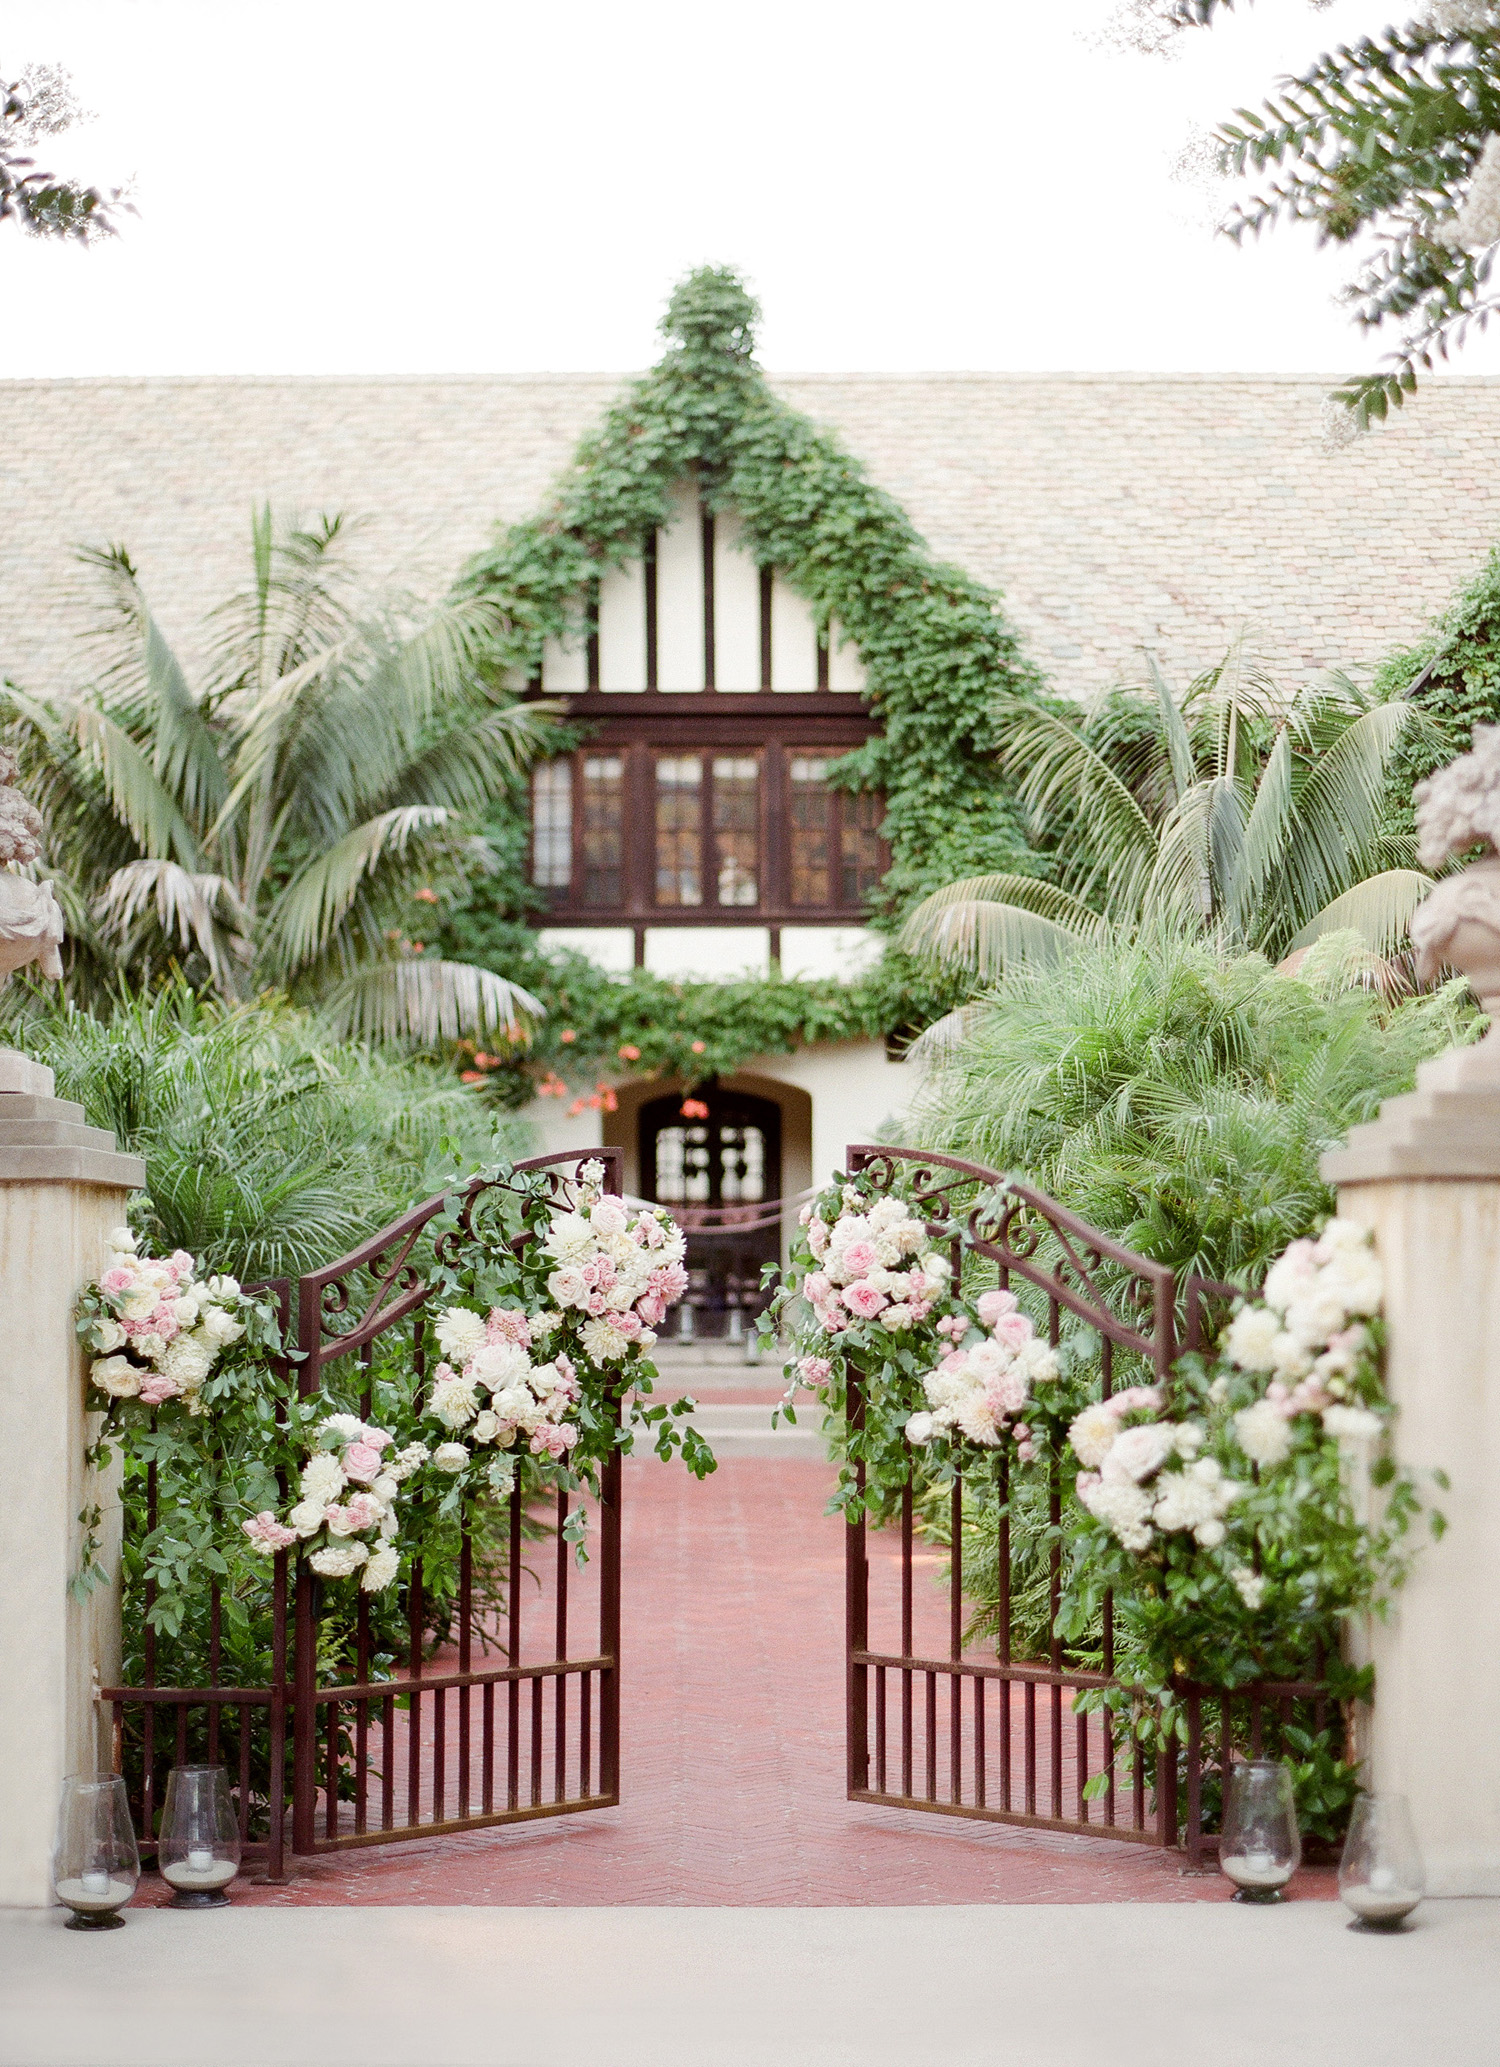 santabarbarawedding.com   Santa Barbara Wedding Style Blog   Private Estate Wedding Inspiration Photographed by Jose Villa   Merryl Brown Events   Hogue and Co